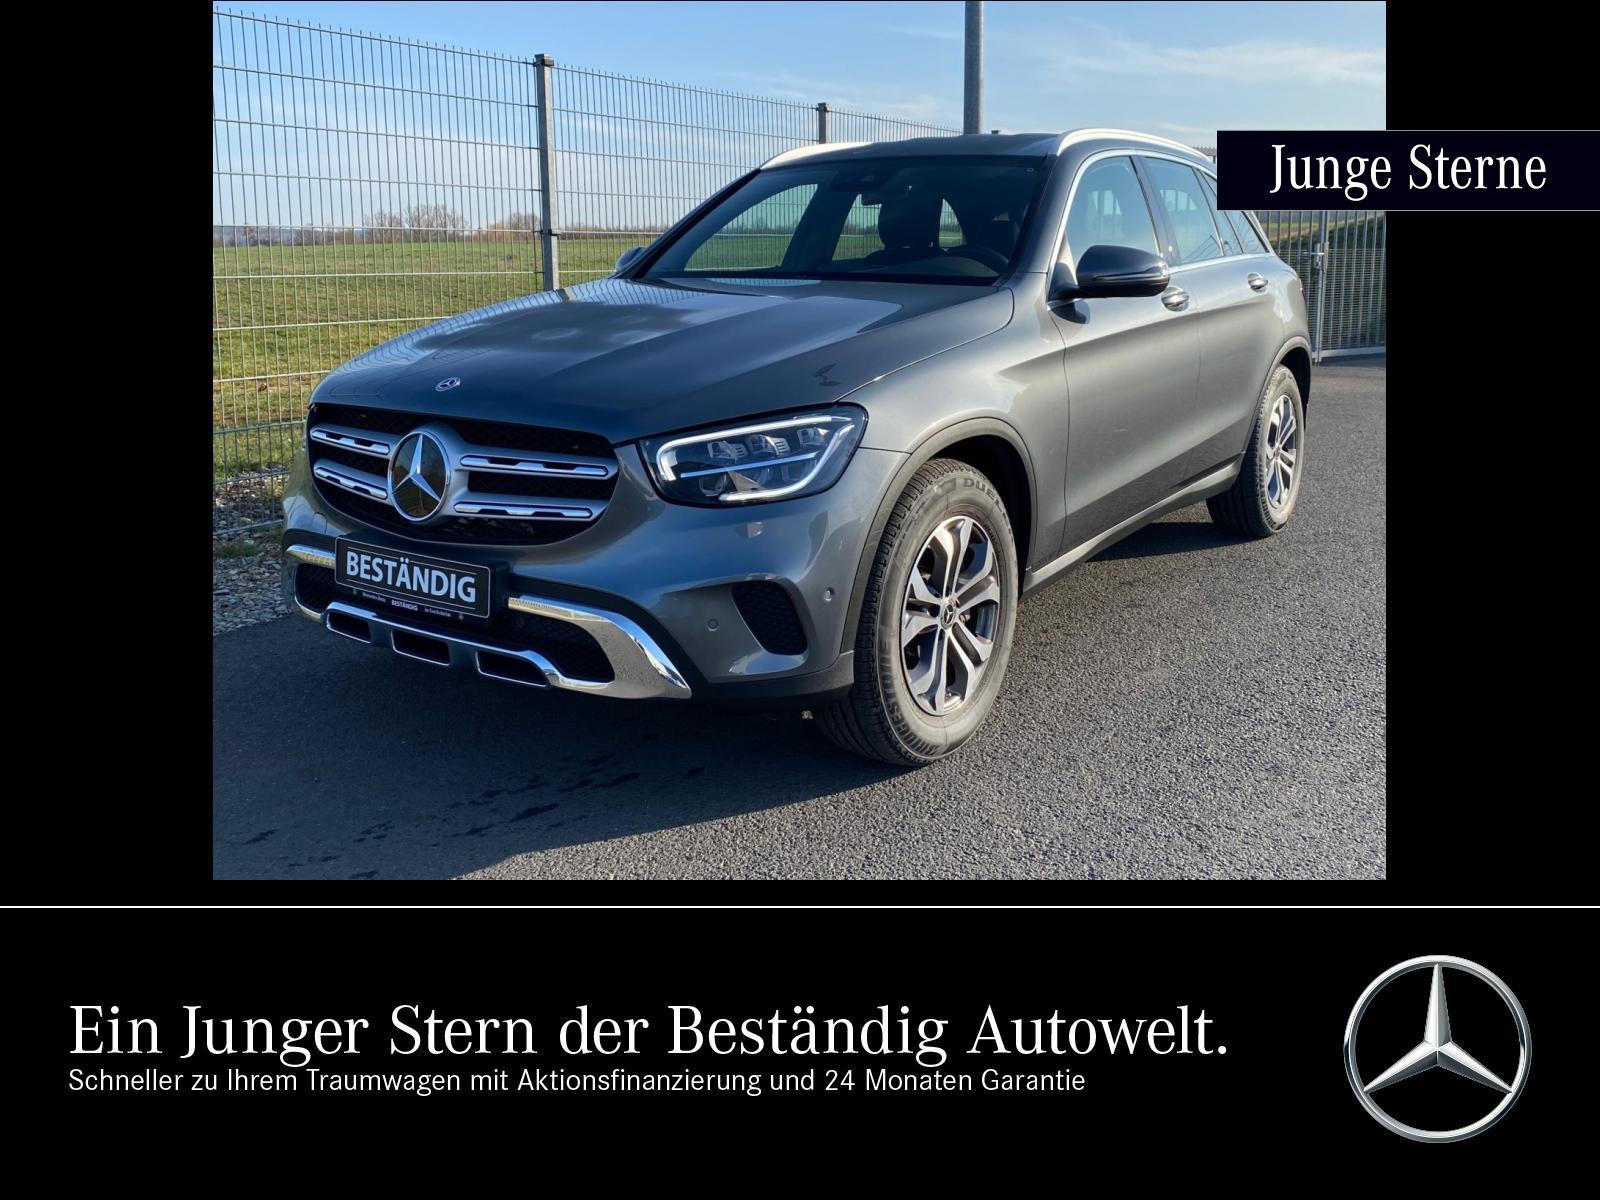 Mercedes-Benz GLC 200 4M +RFK+LED+Busi.Paket+DAB+EASY PACK, Jahr 2019, Benzin